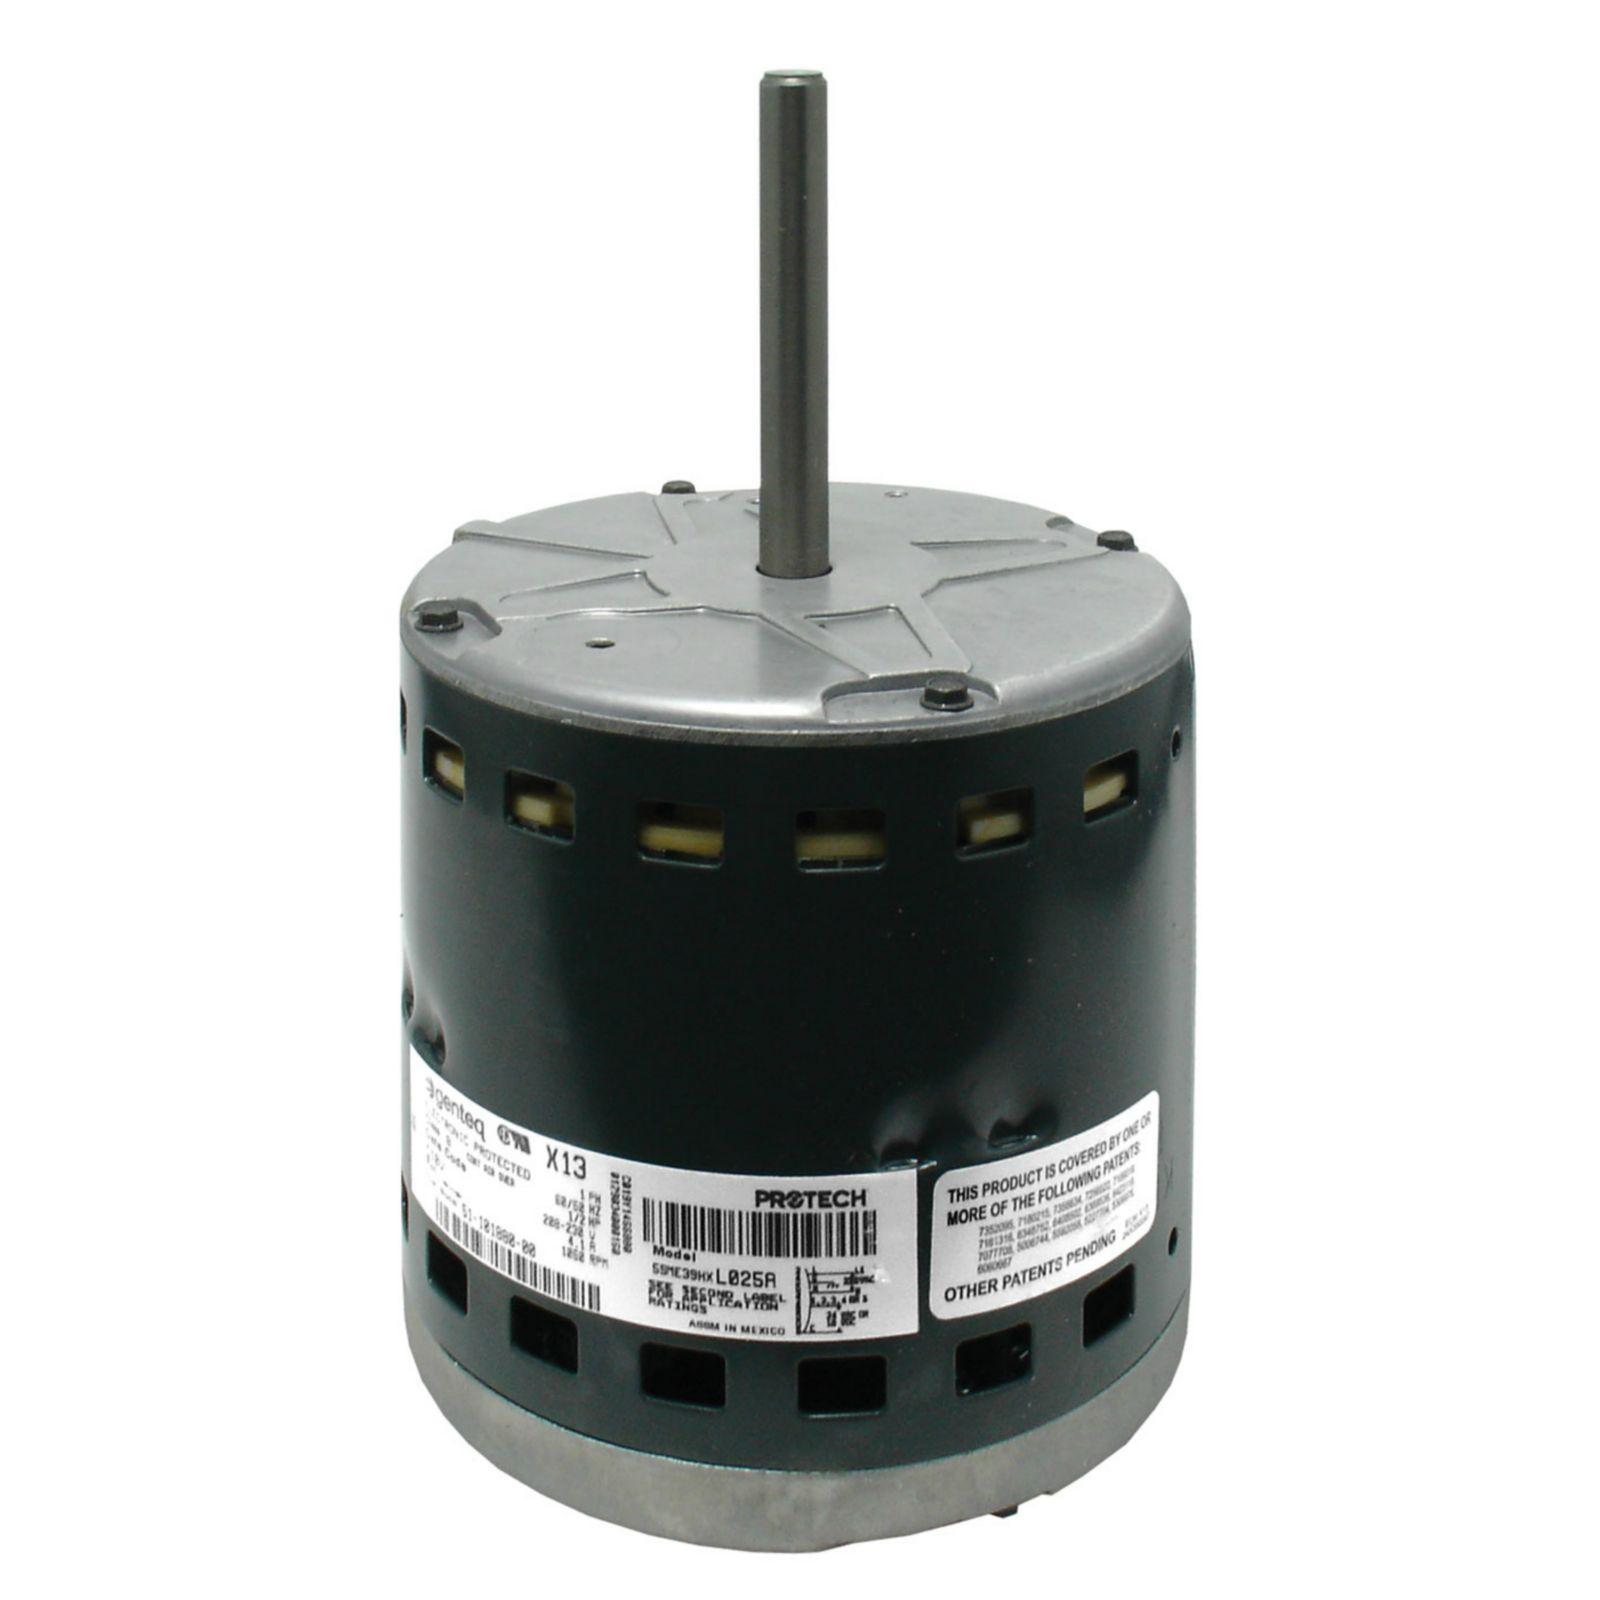 Rheem X 13 Motor Wiring Diagram 3 Speed Furnace Genteq 51 101880 00 And Module 230v